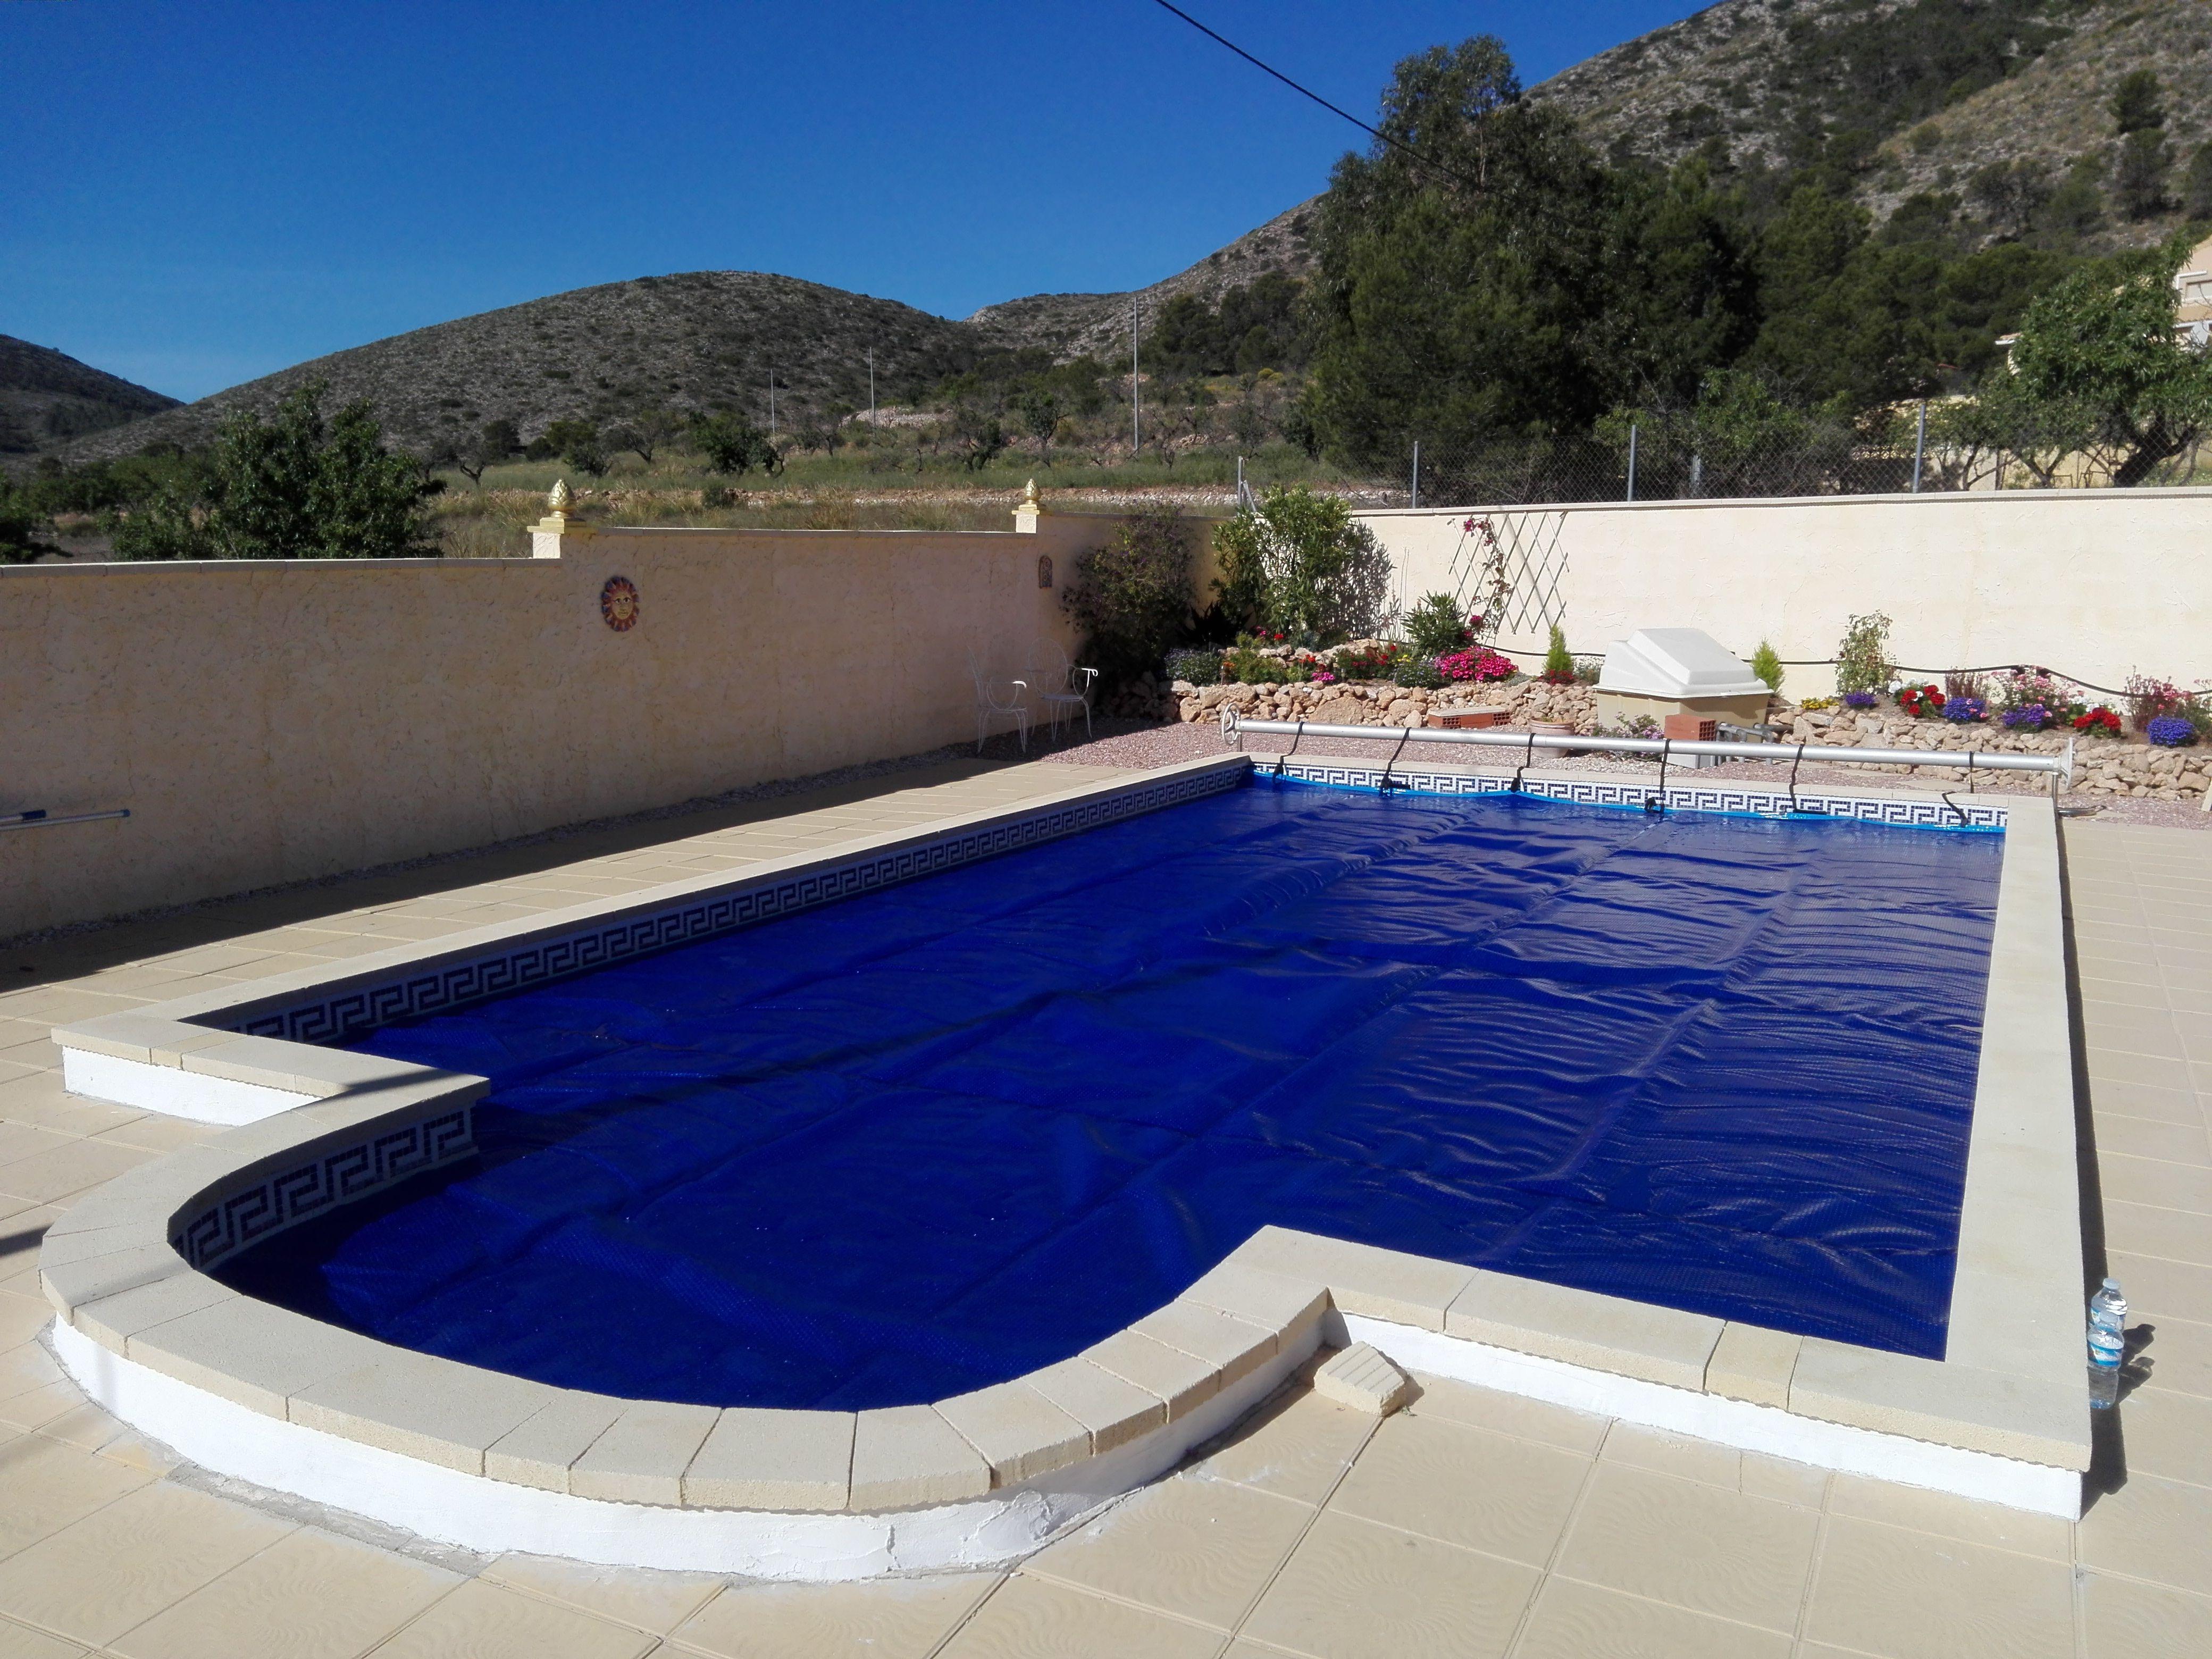 Mantas termicas para piscinas precios amazing img with mantas termicas para piscinas precios - Mantas termicas para piscinas ...